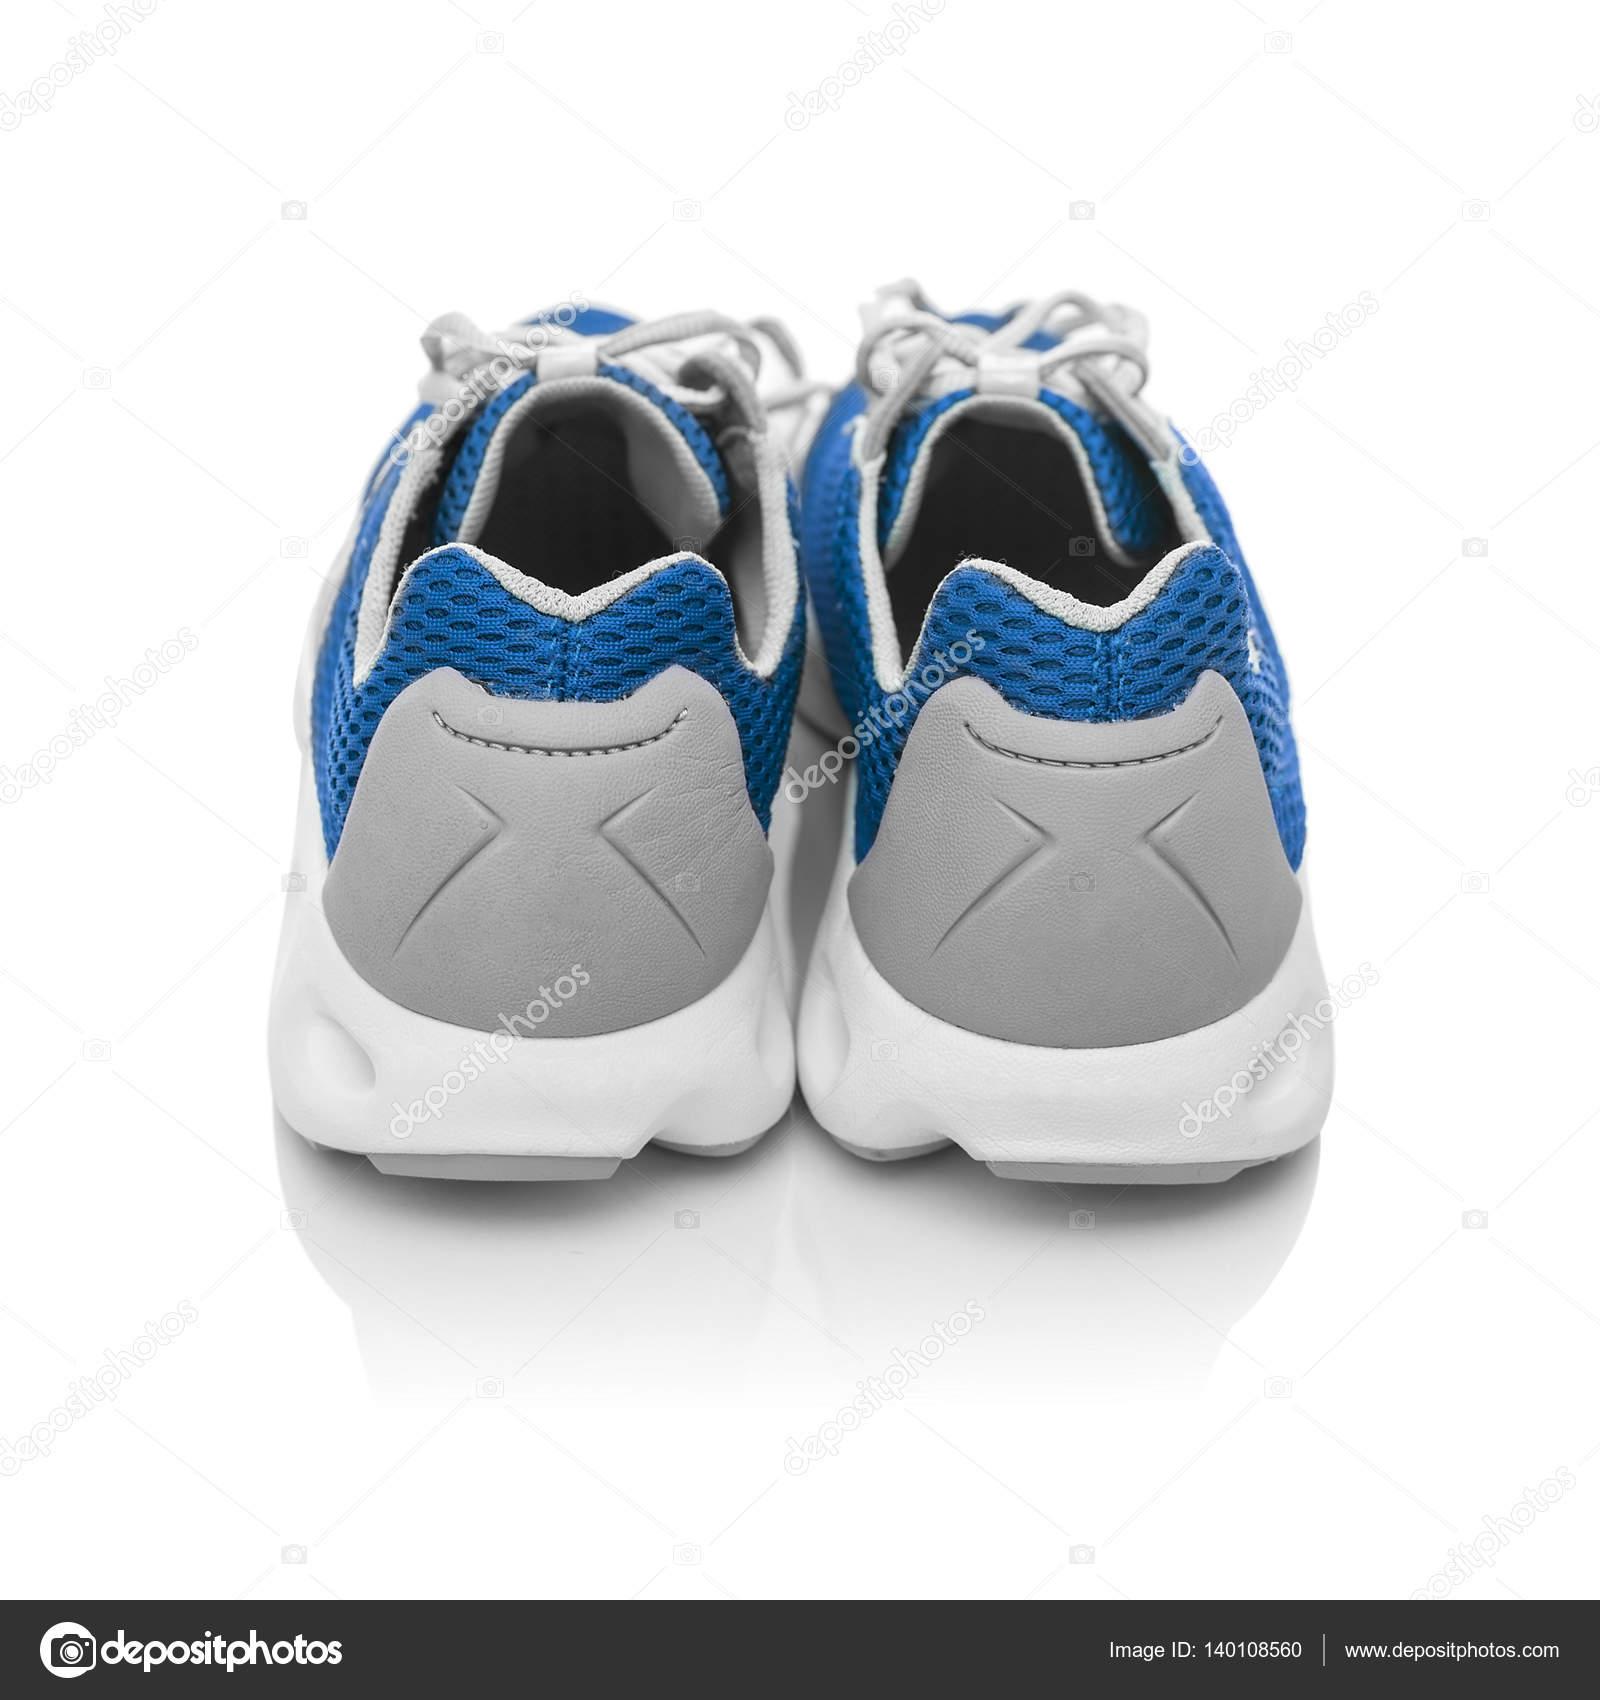 Believeinme — Sport Photographie Chaussures De Sans Marque Modernes 6TwCxf0X